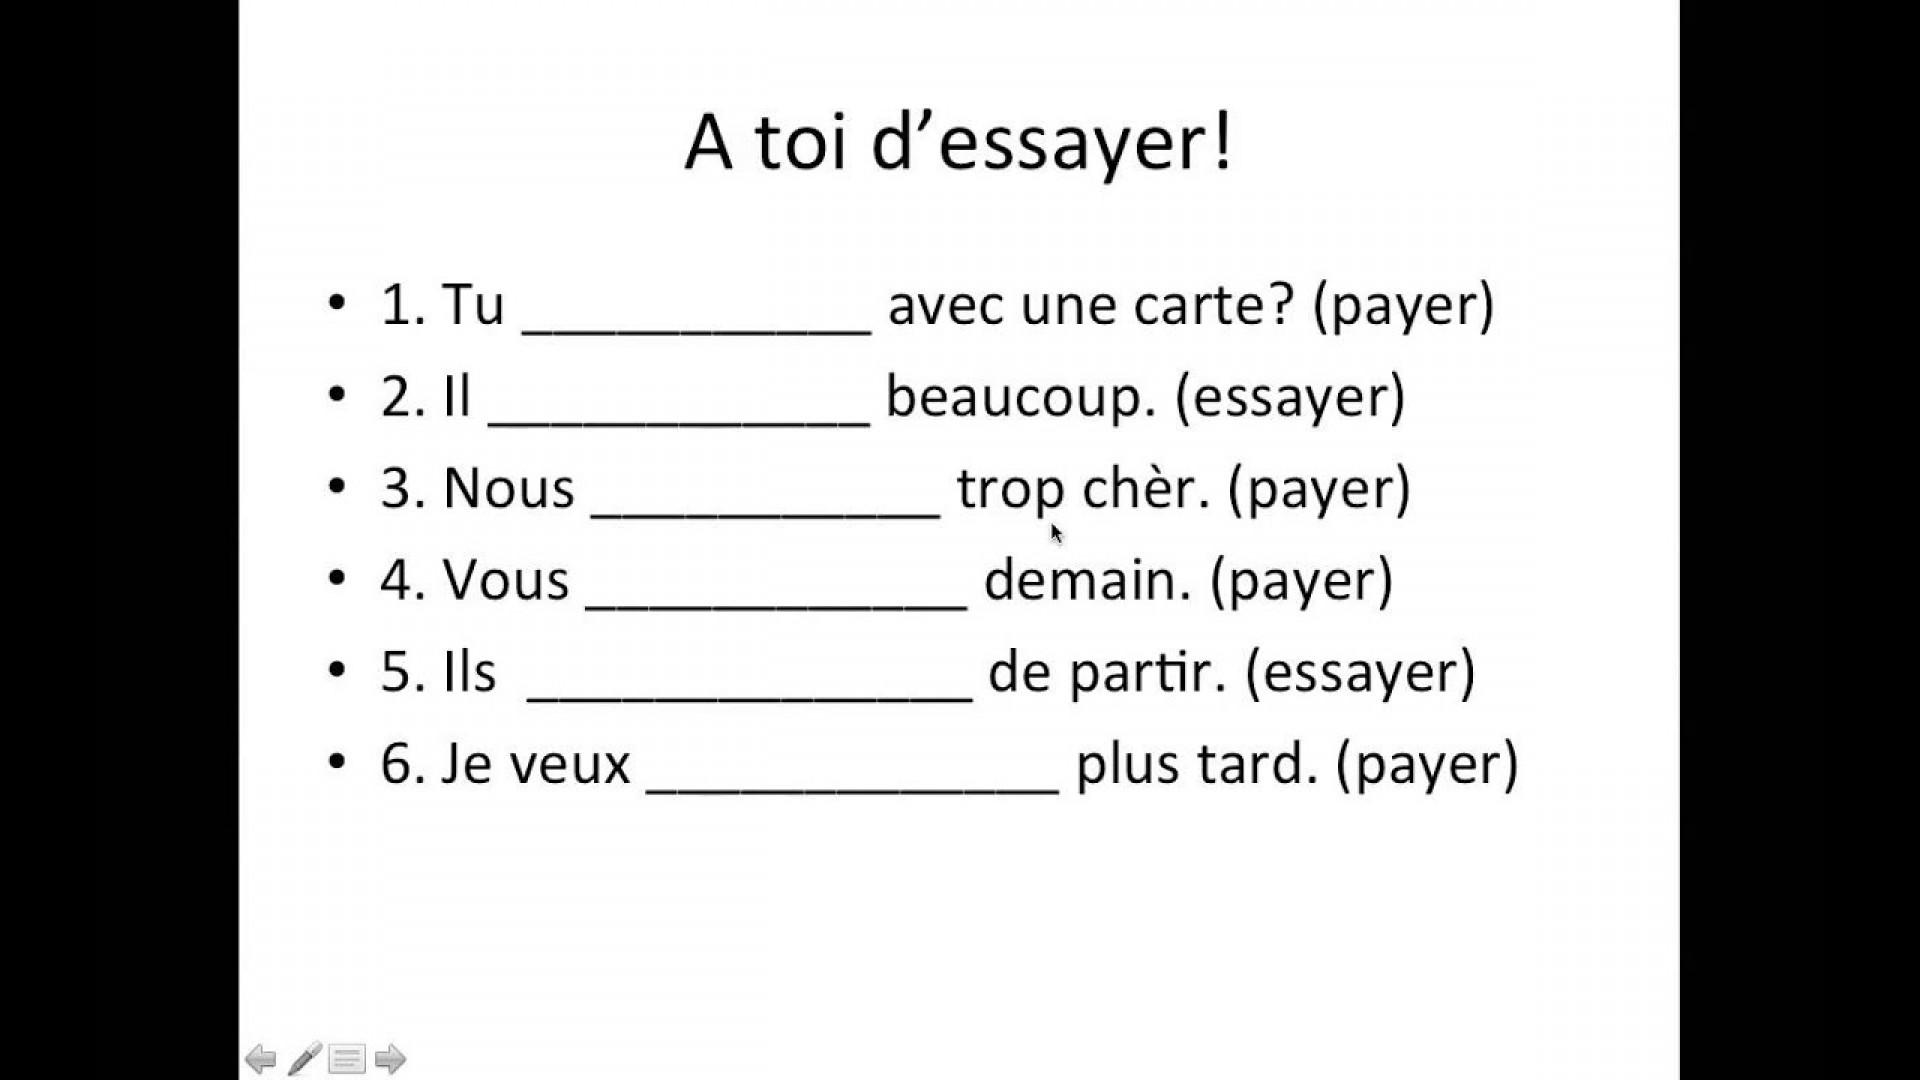 003 Essay Example Essayer Conjugation French Breathtaking Future Verb Past 1920